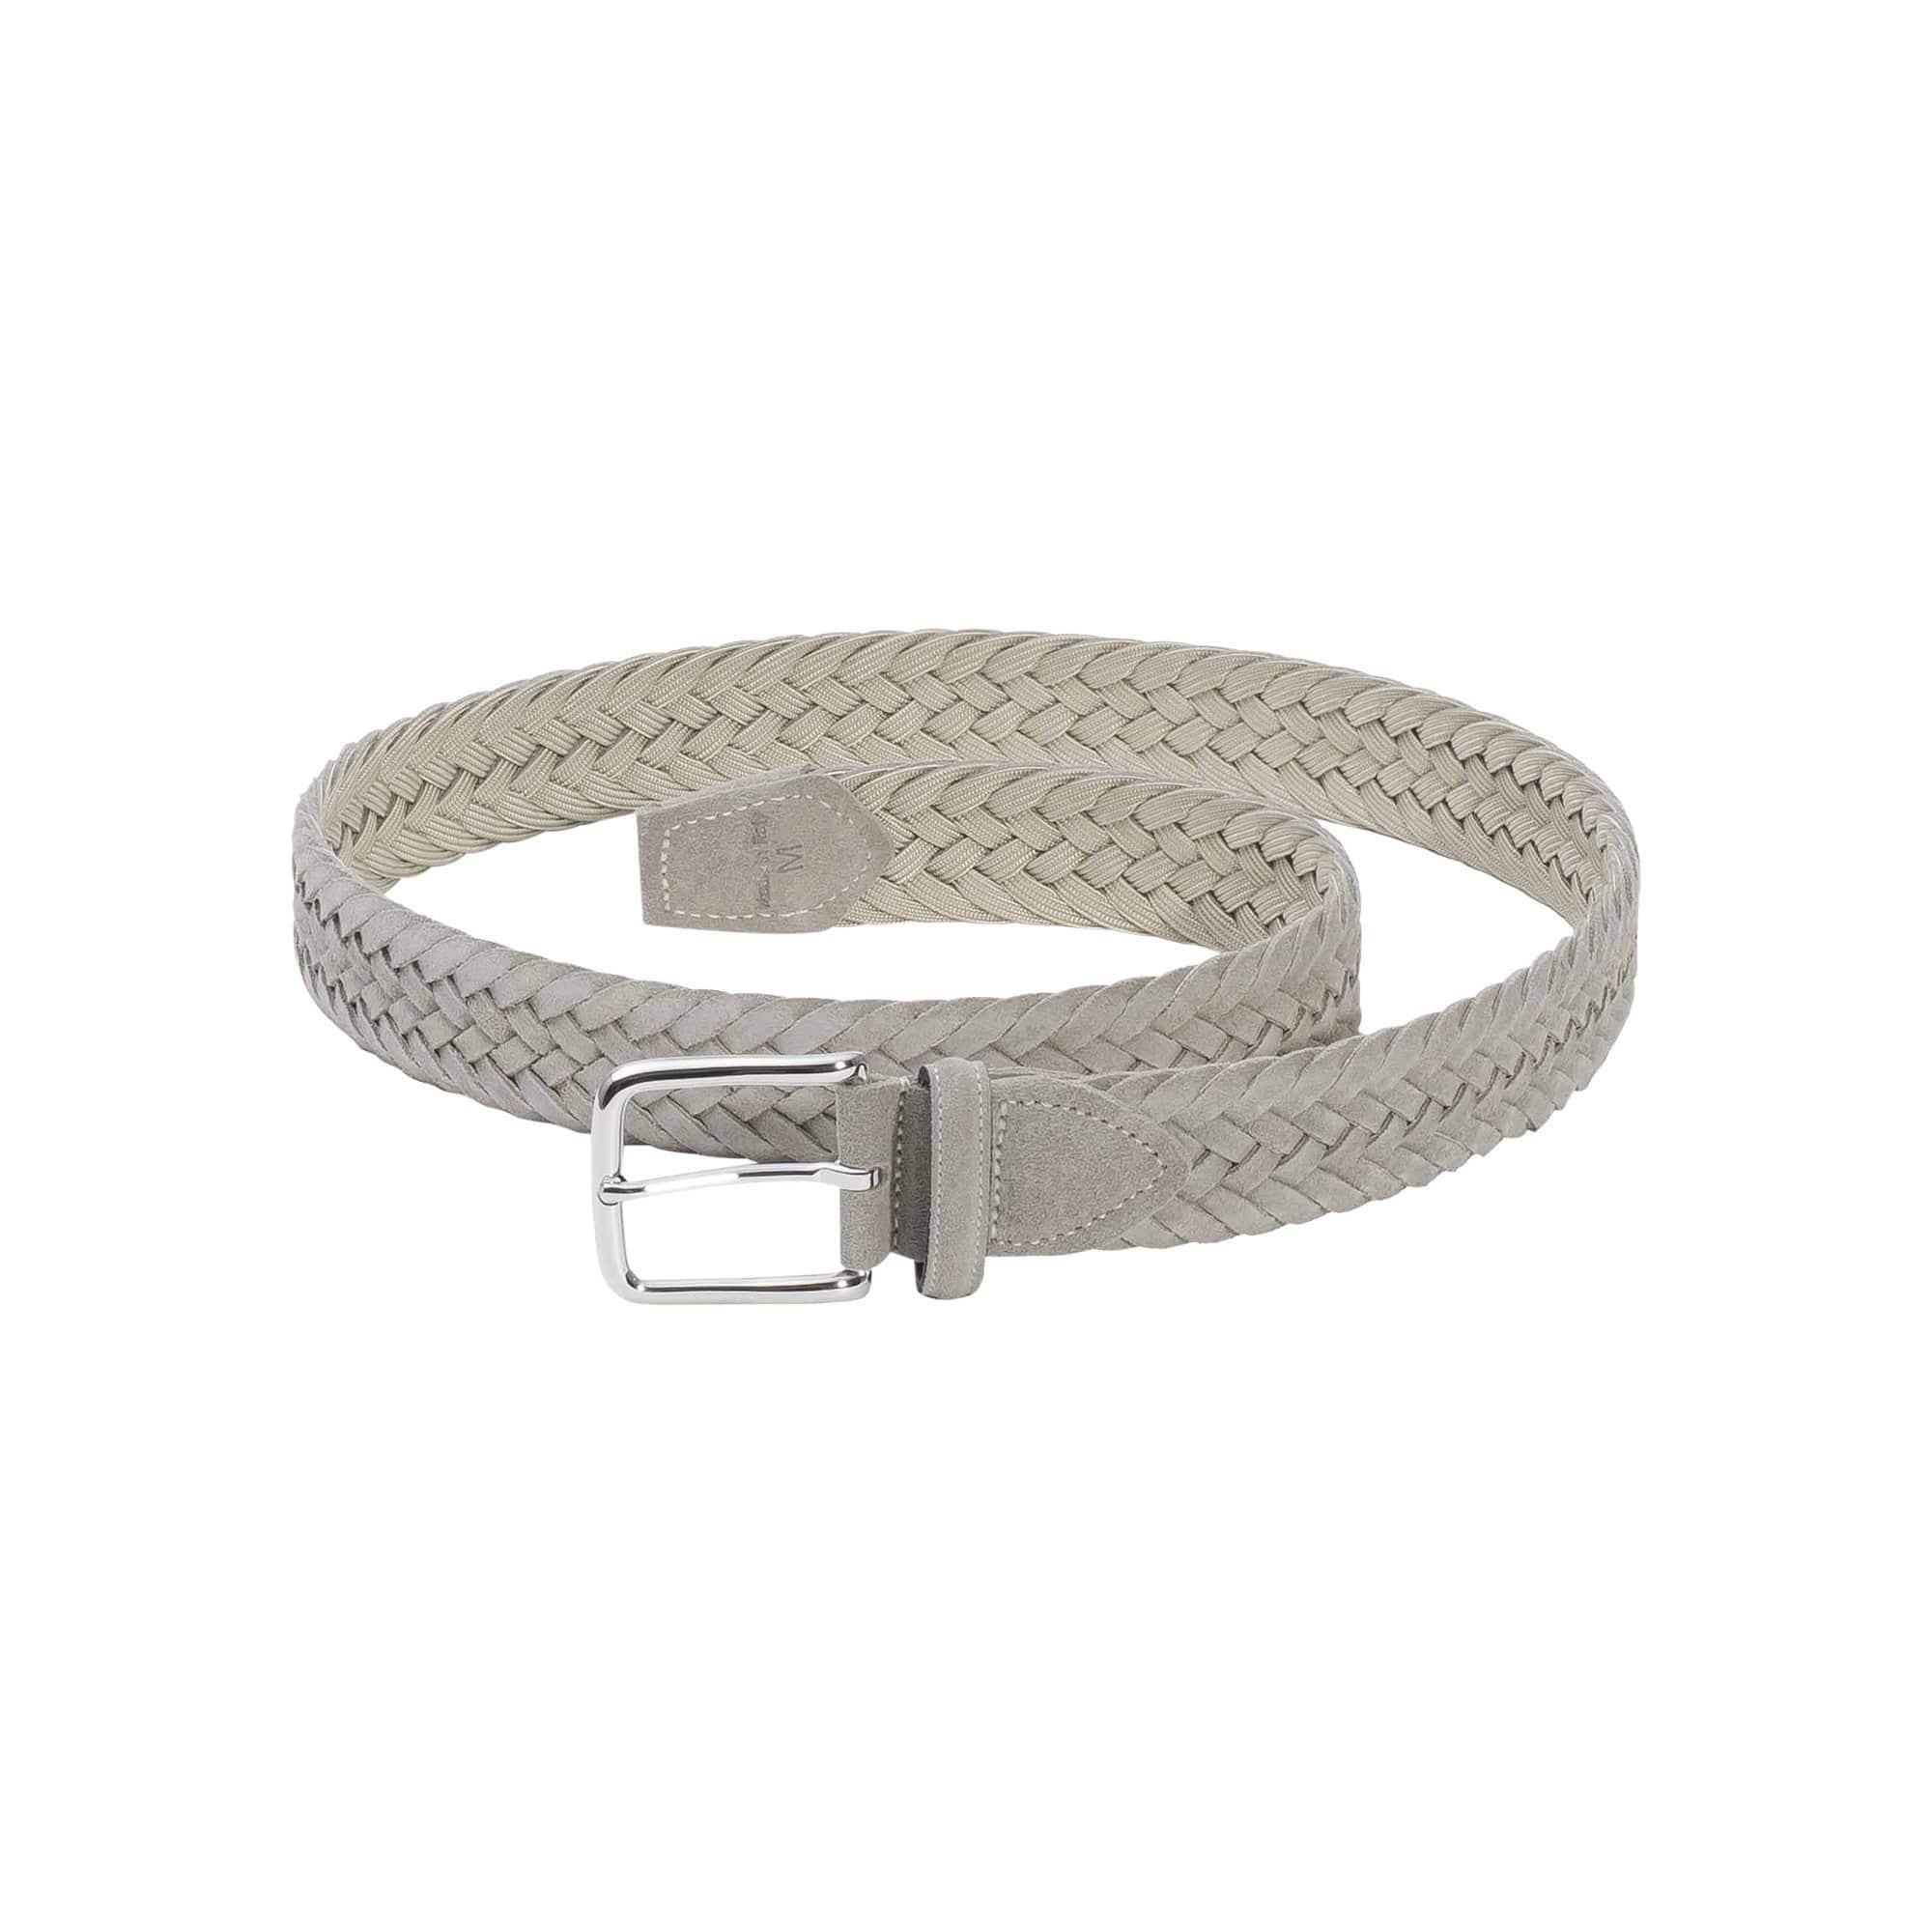 Dalgado Grey Gianluca Braided Suede Belt -  unisex - multicolor - Size: one fit